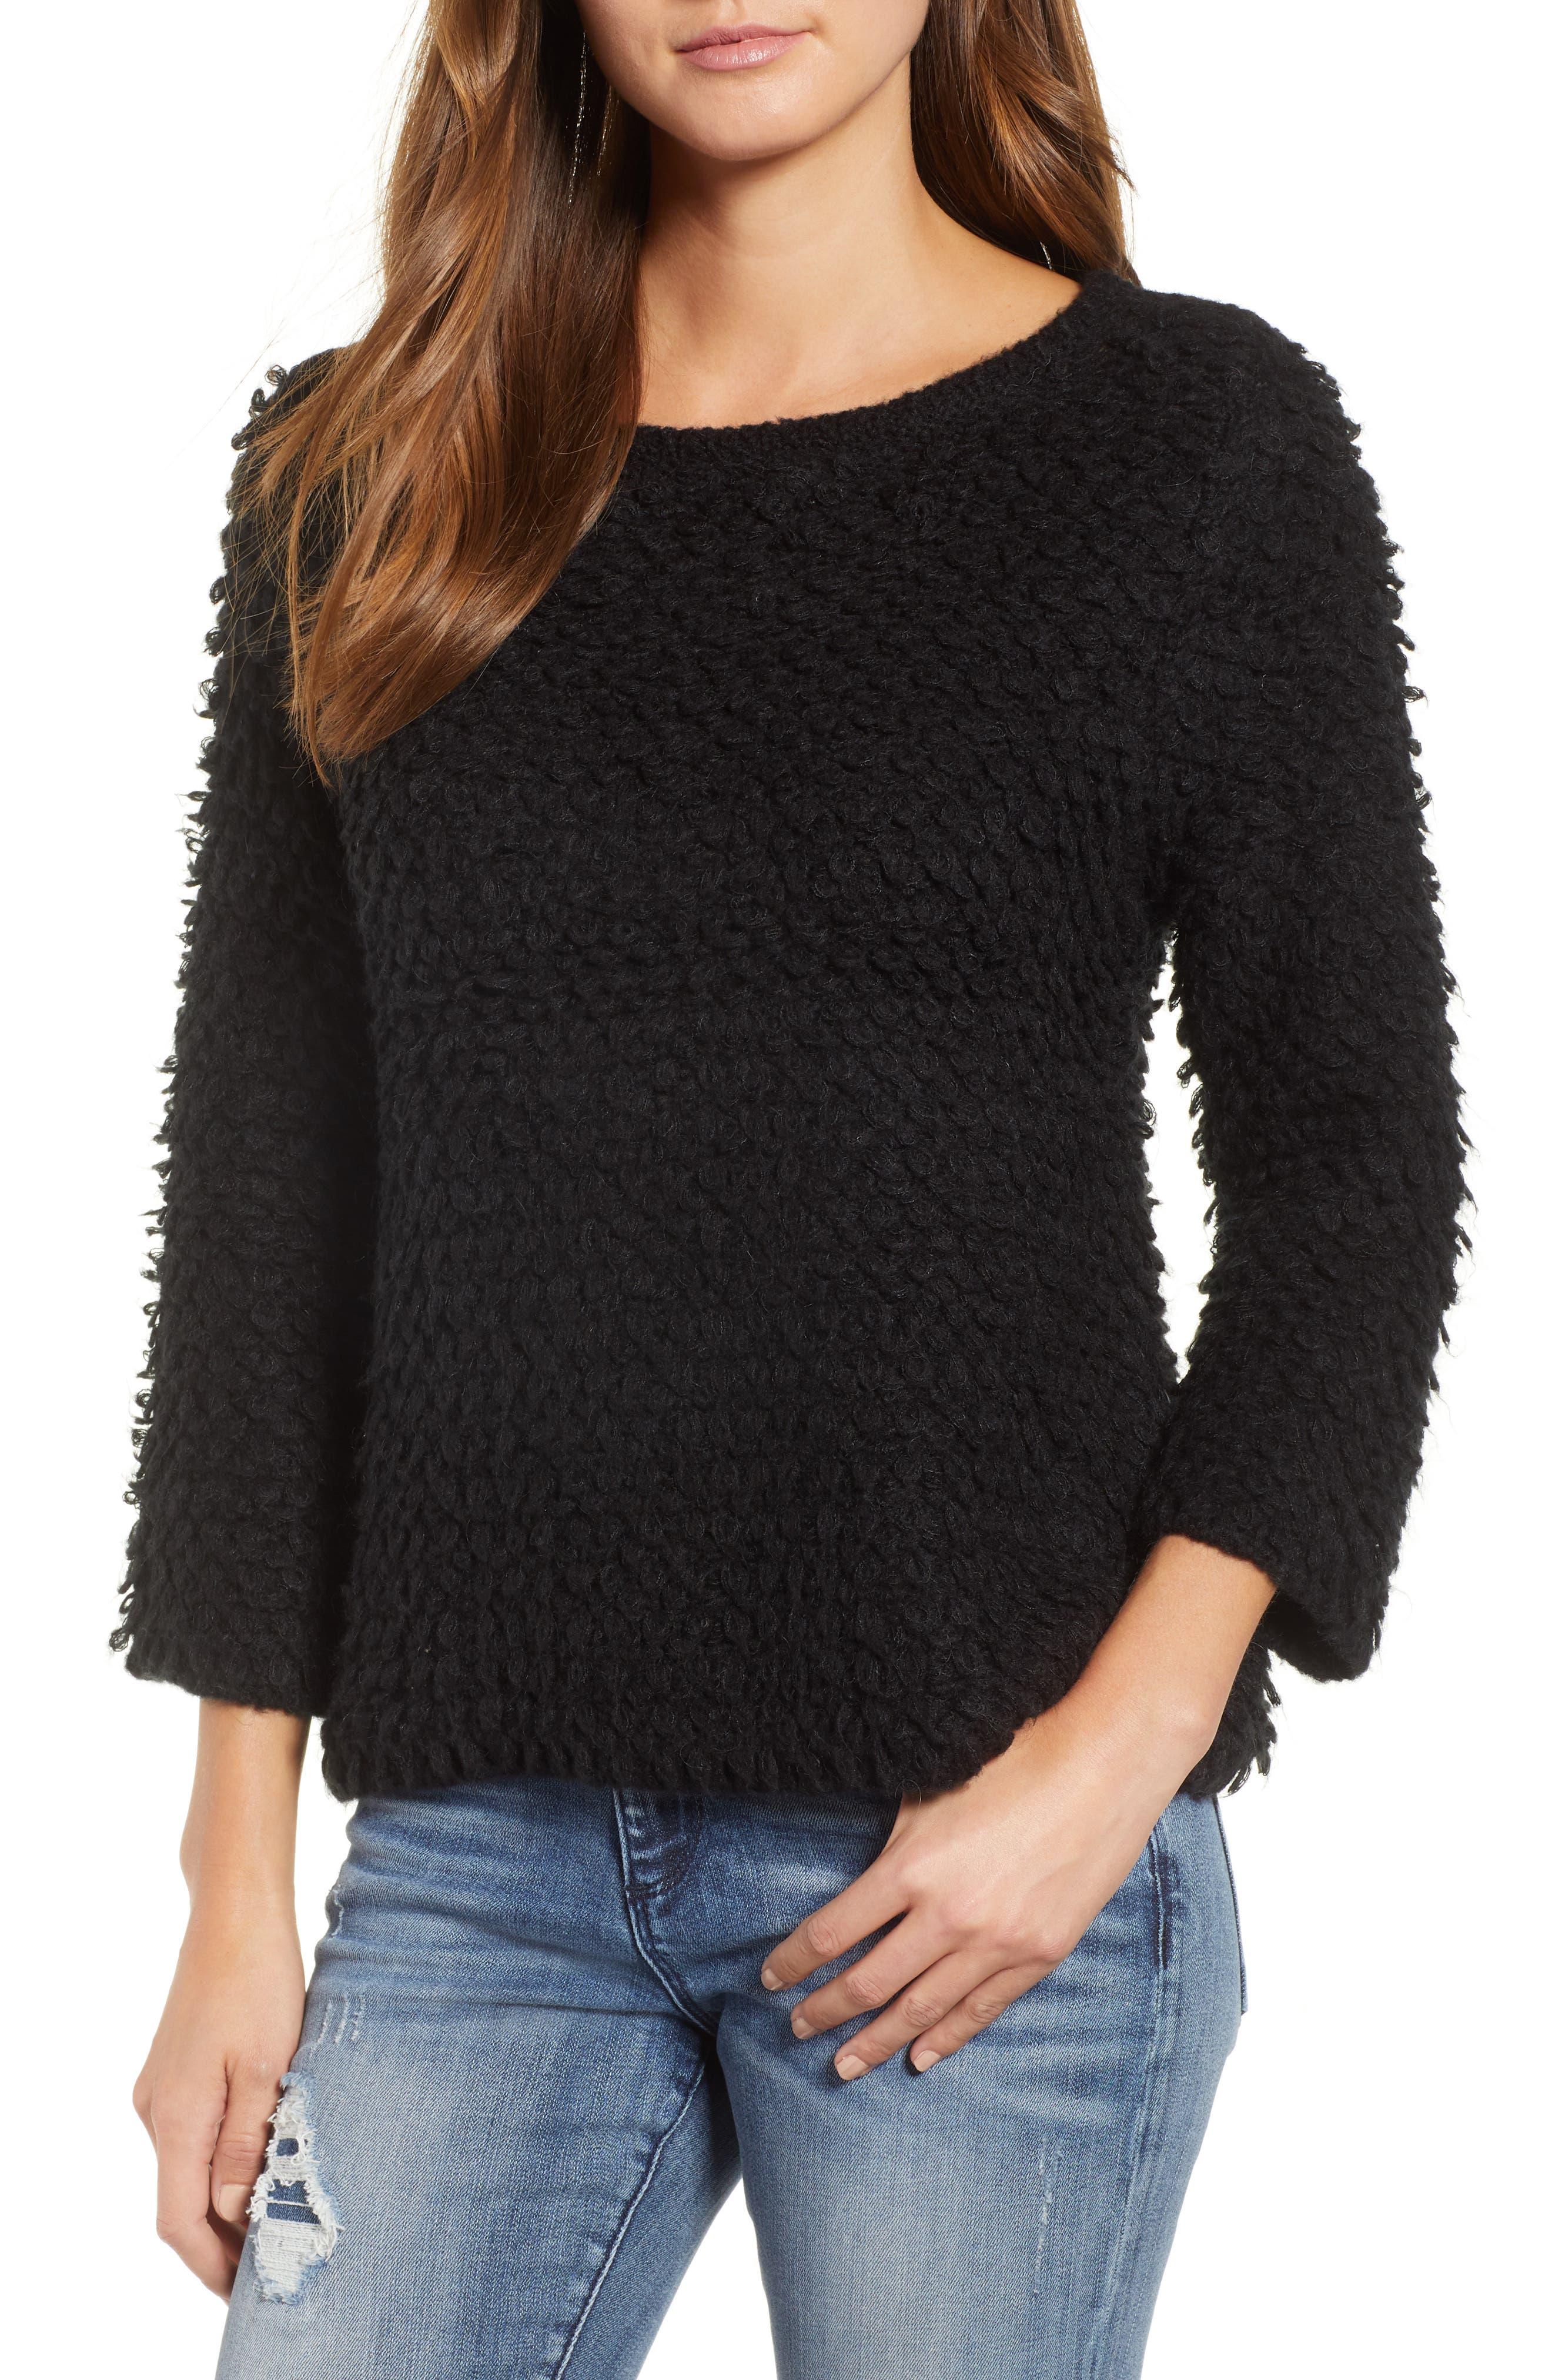 Loop Stitch Crewneck Sweater,                             Main thumbnail 1, color,                             Black